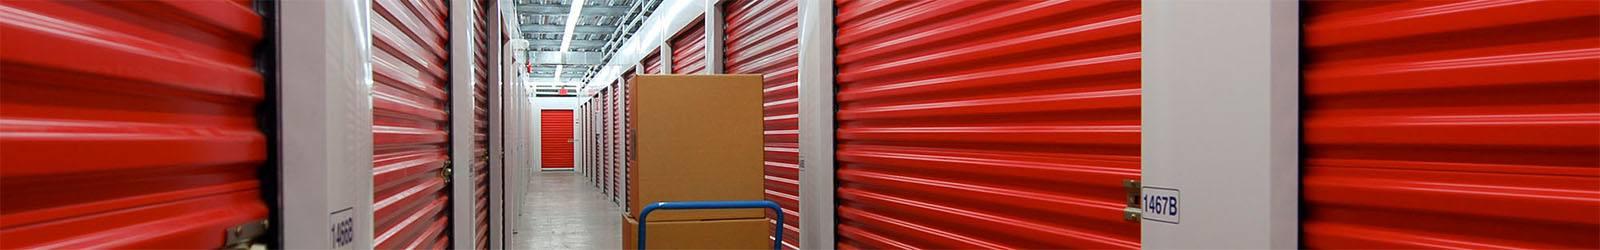 Storage units in Victoria, BC